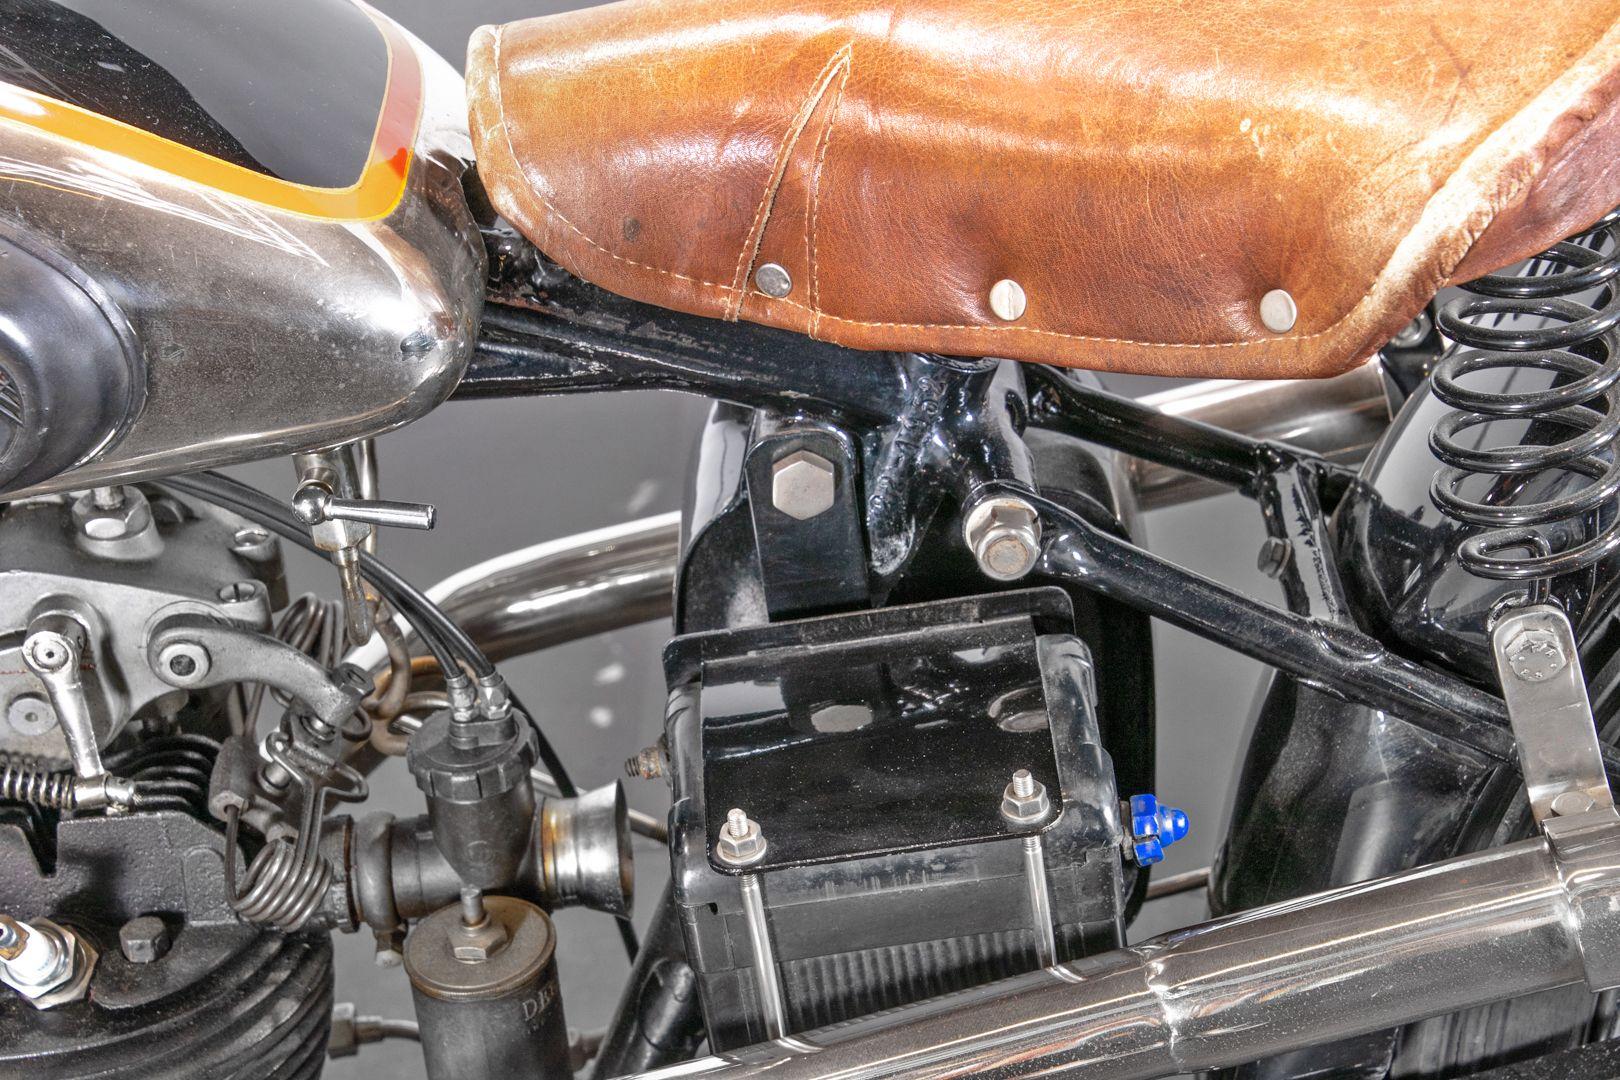 1934 Benelli 220 Sport 74381